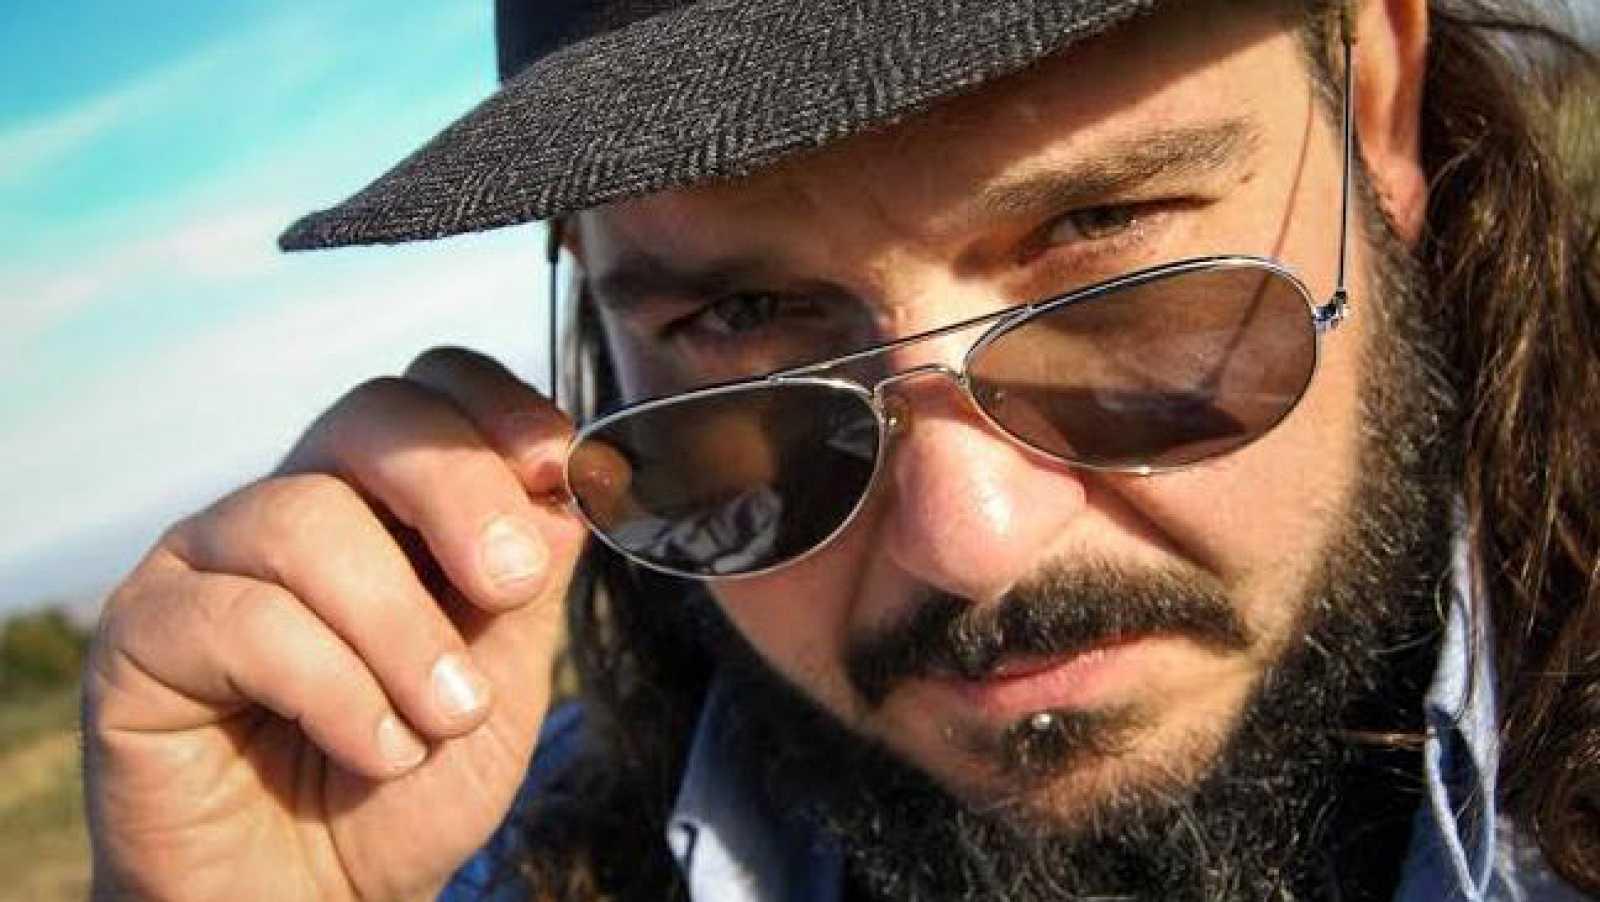 Artesfera - Balta Cano presenta 'Analogía punta' - 22/02/17 - escuchar ahora